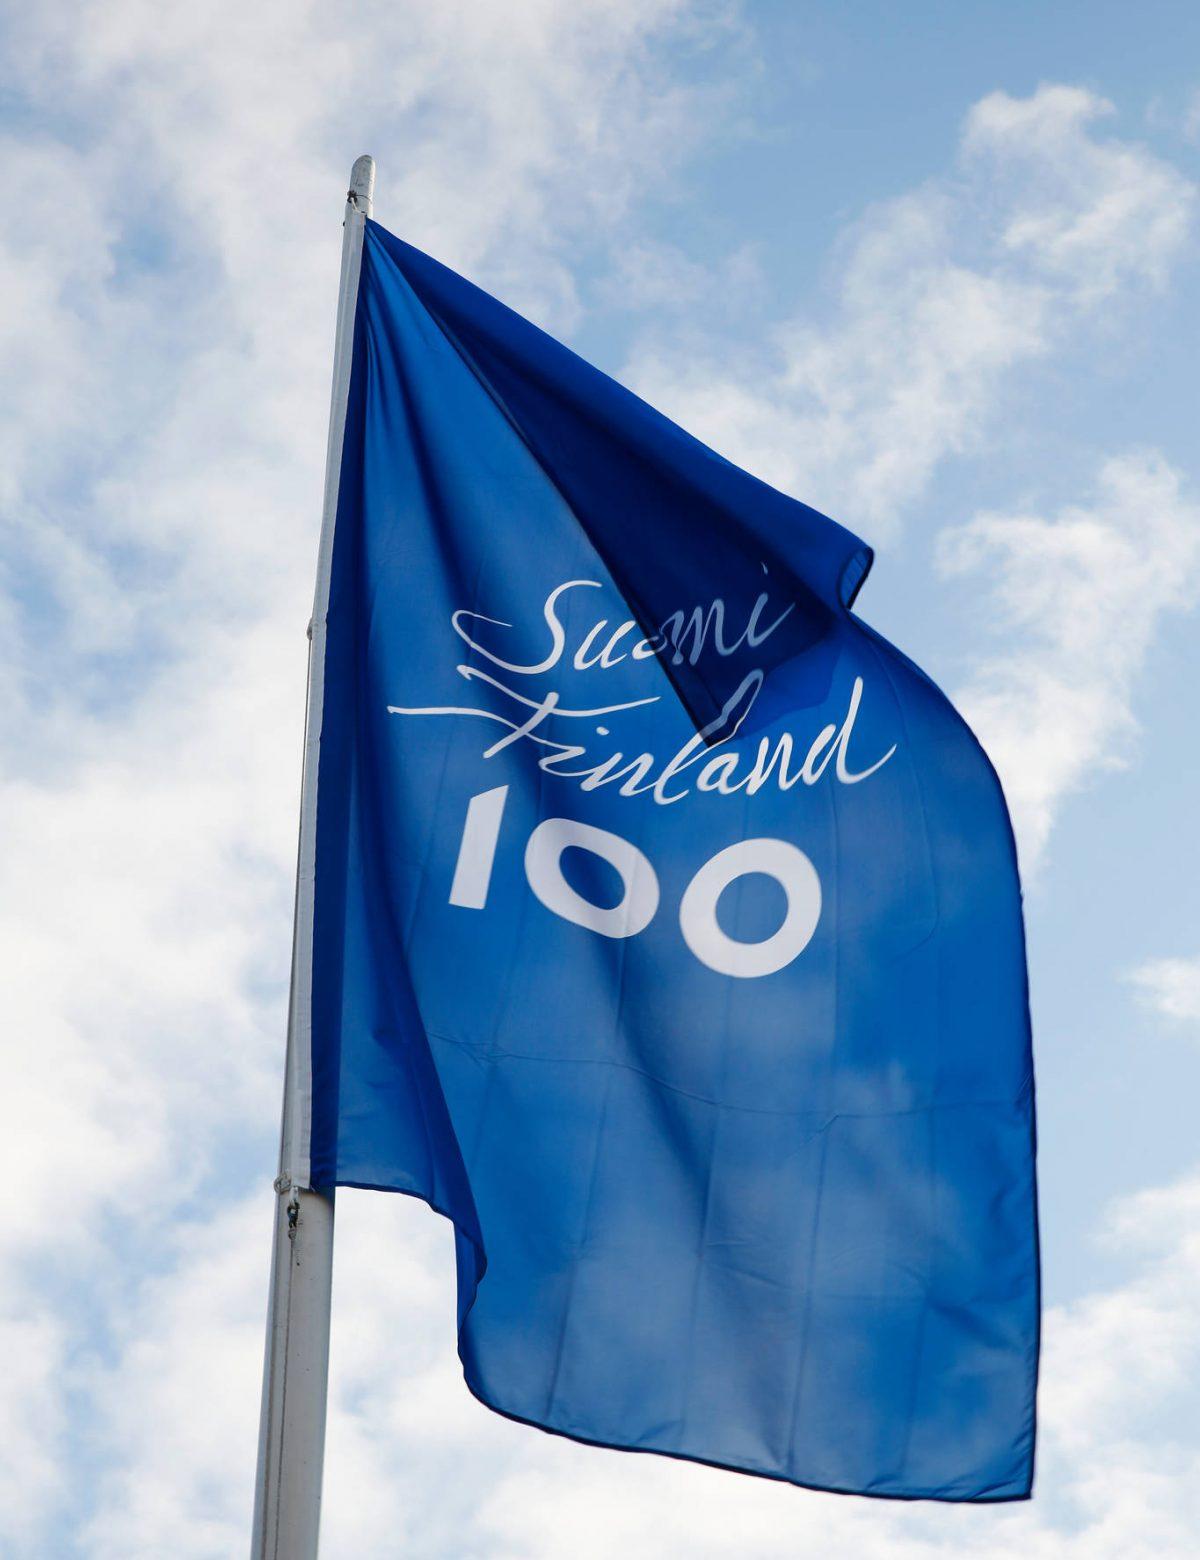 100 bilder grattis Grattis Finland 100 år   Onnea Suomi 100 vuotta!   Uppsala Konsert  100 bilder grattis